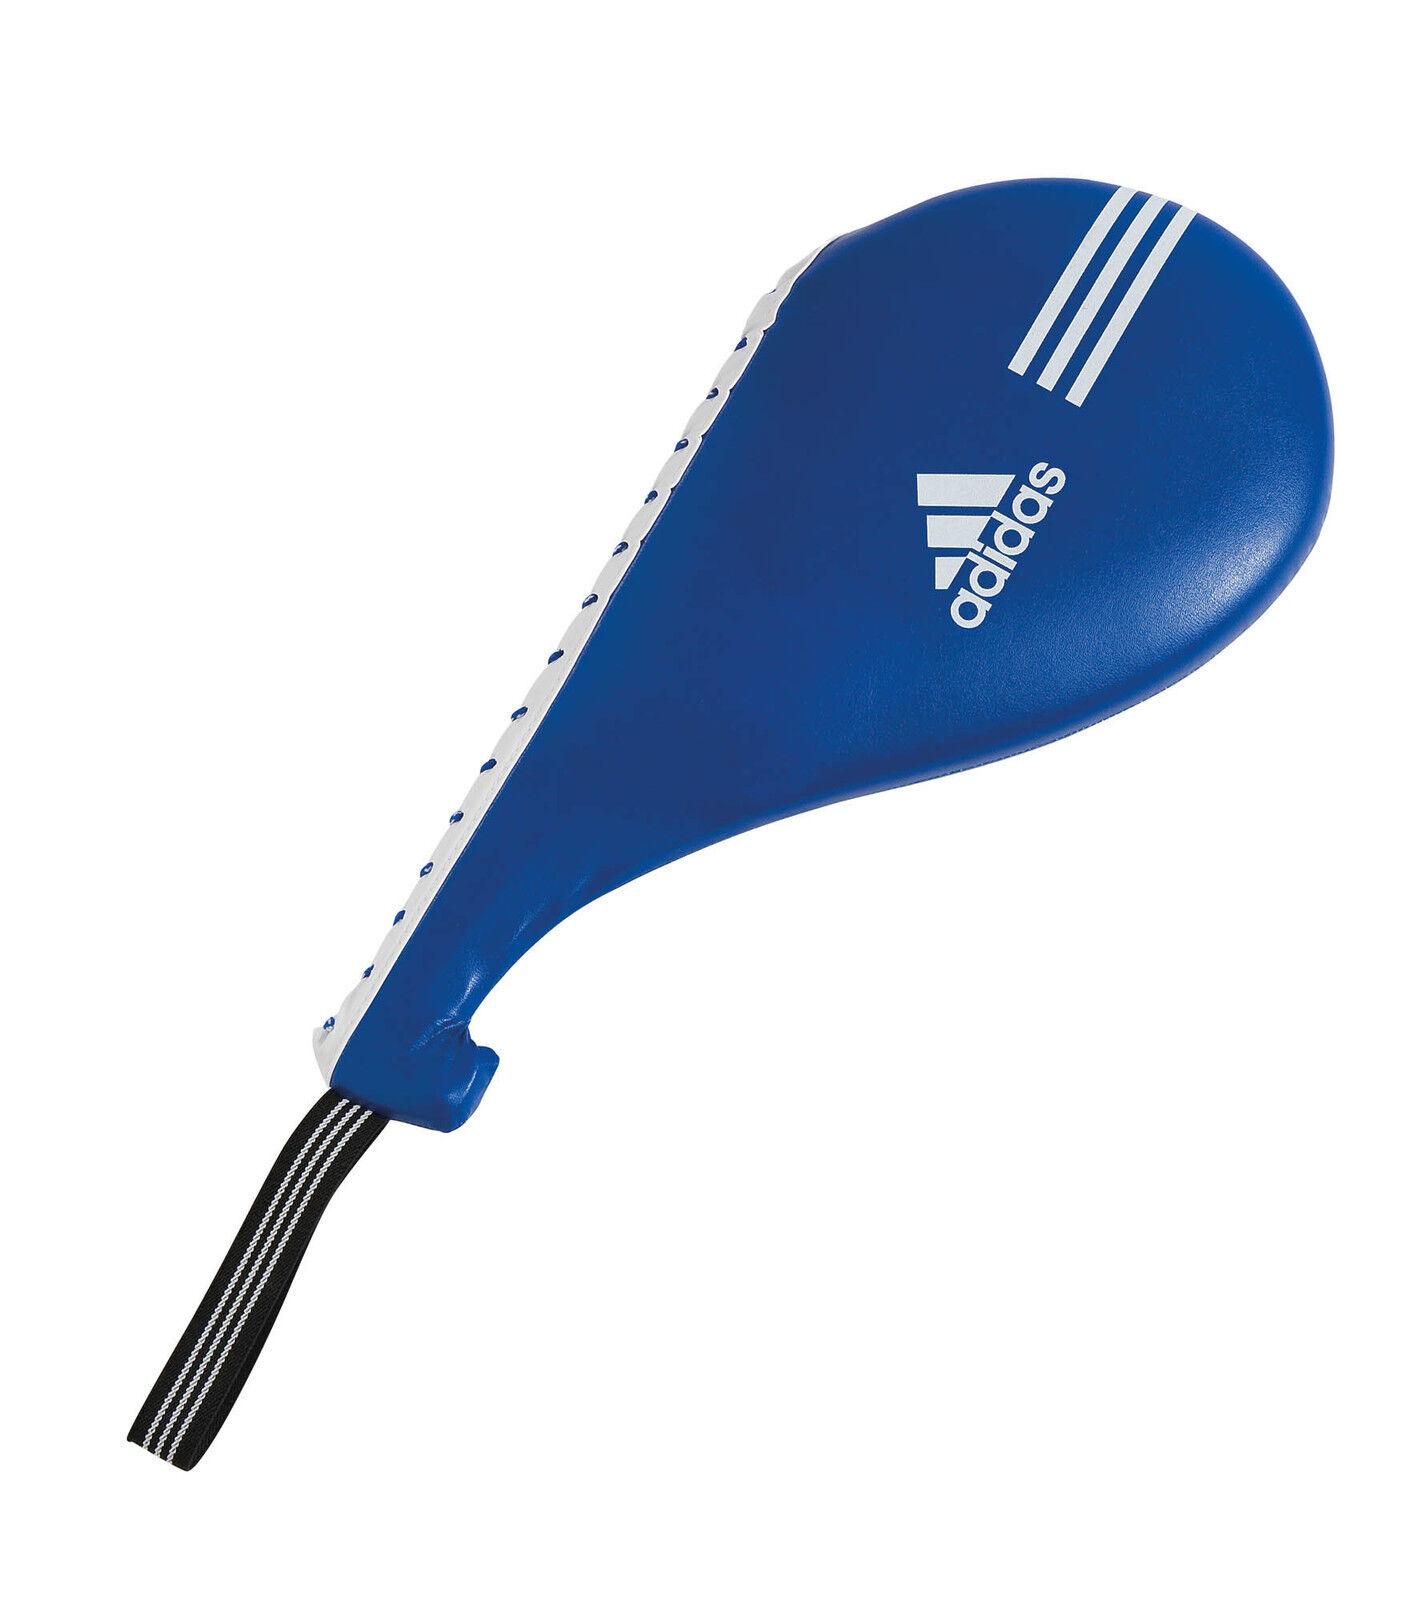 Adidas Adidas Adidas Taekwondo Single Mitt Taekwondo blau  S oder L ADITST01, Handpratze 588d91